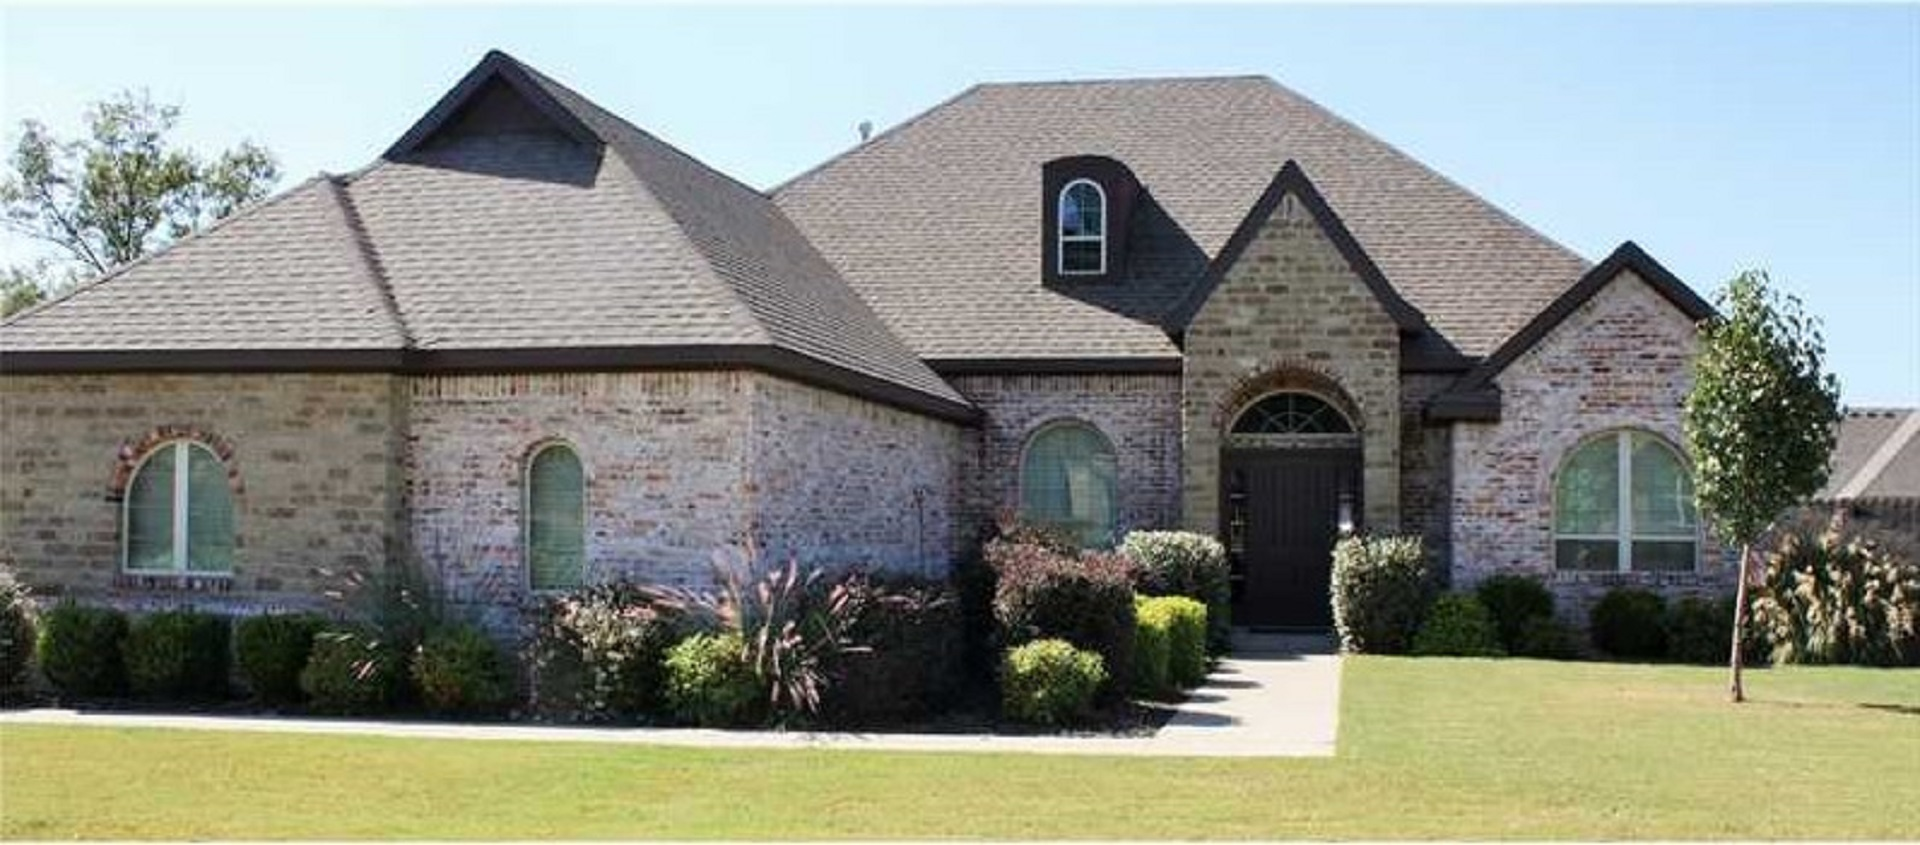 12914 Limestone Dr., Fort Smith, Arkansas 72916